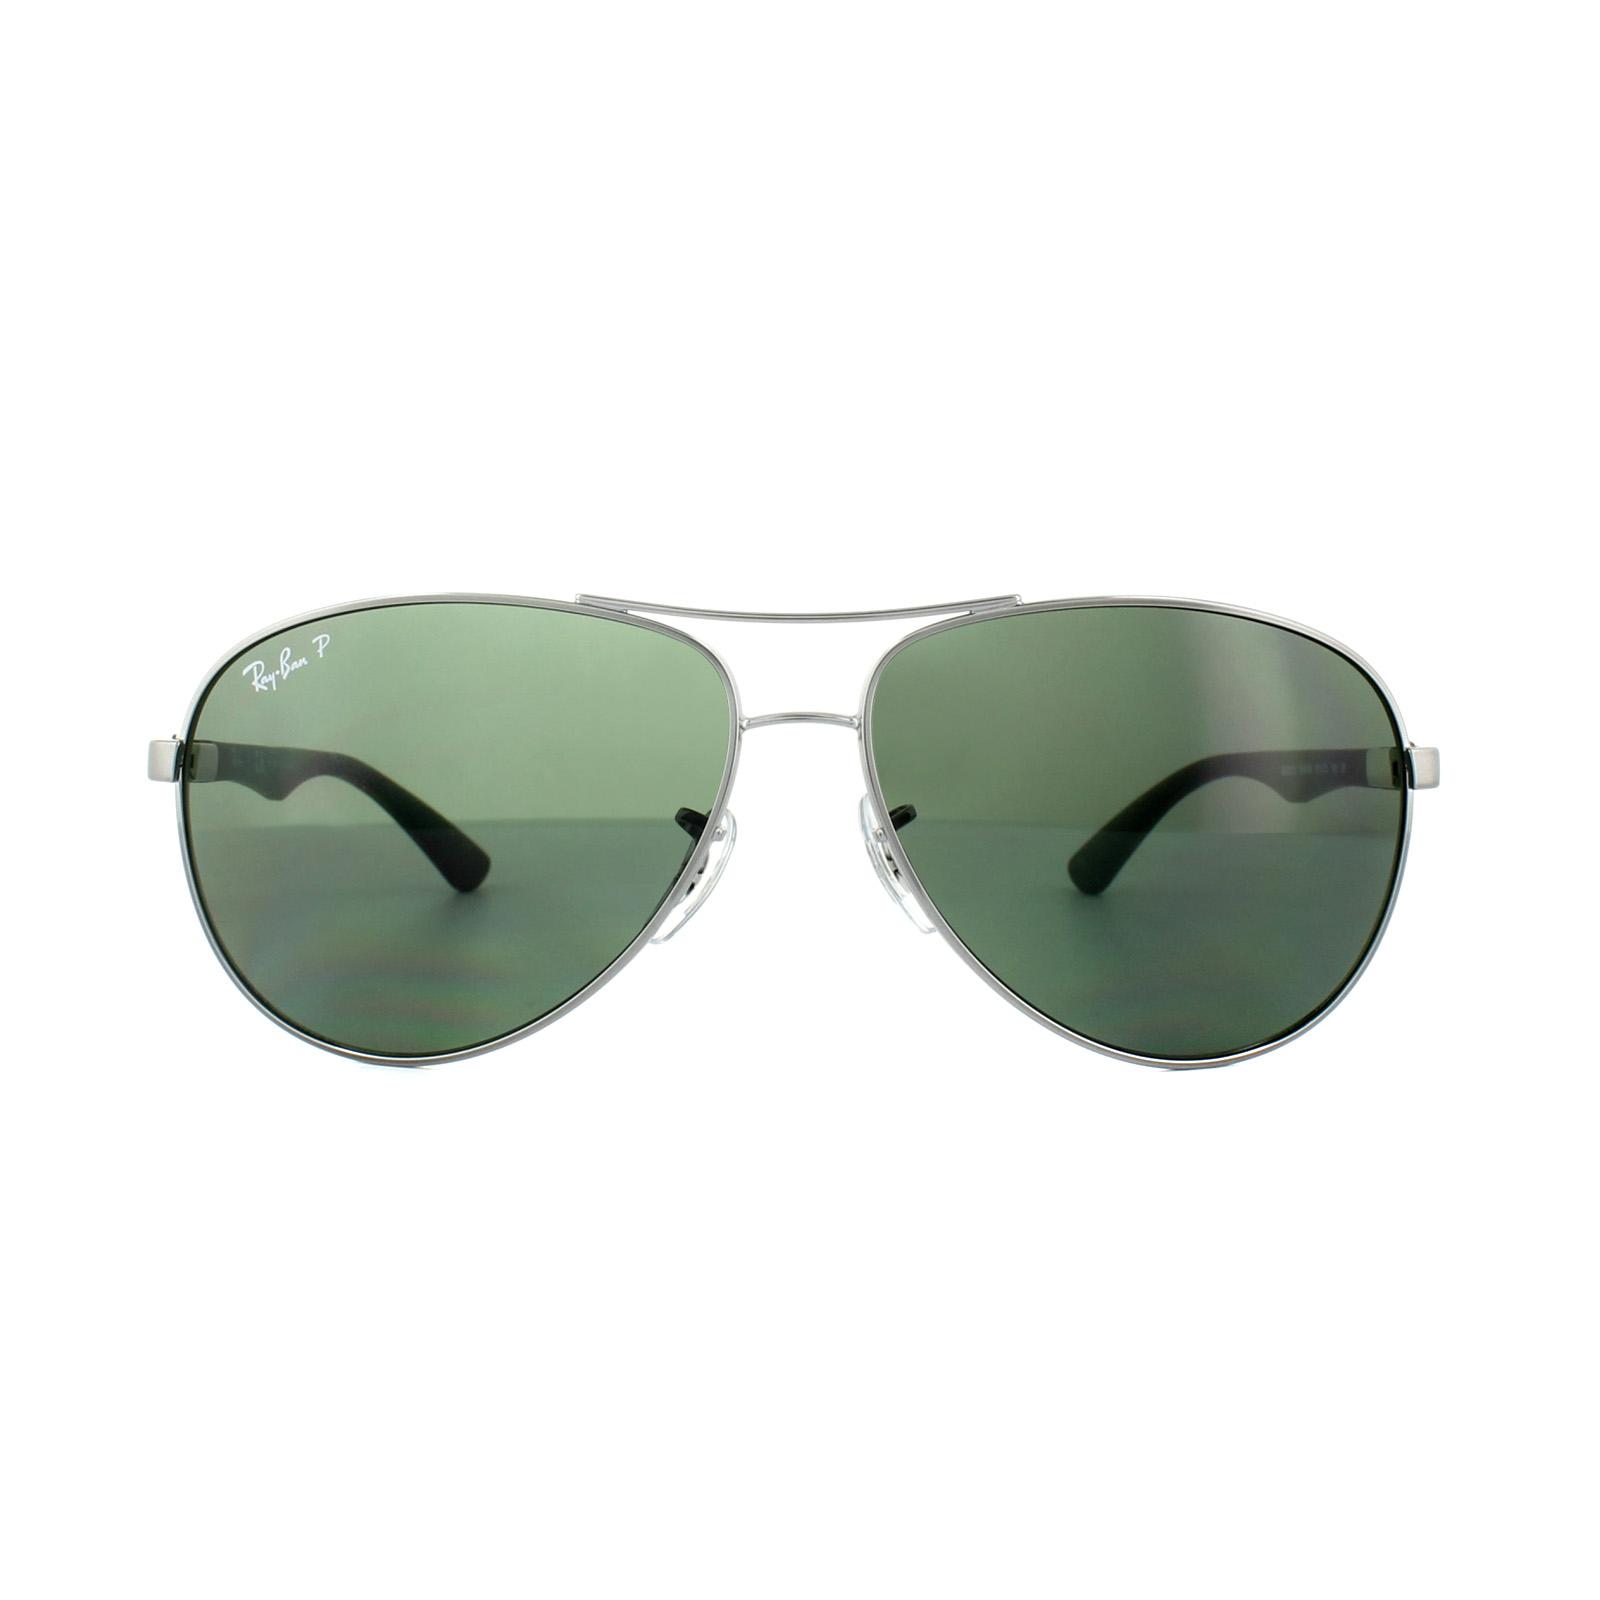 ef3e15e761 Sentinel Ray-Ban Sunglasses 8313 004 N5 Gunmetal Grey Polarized 61mm Large